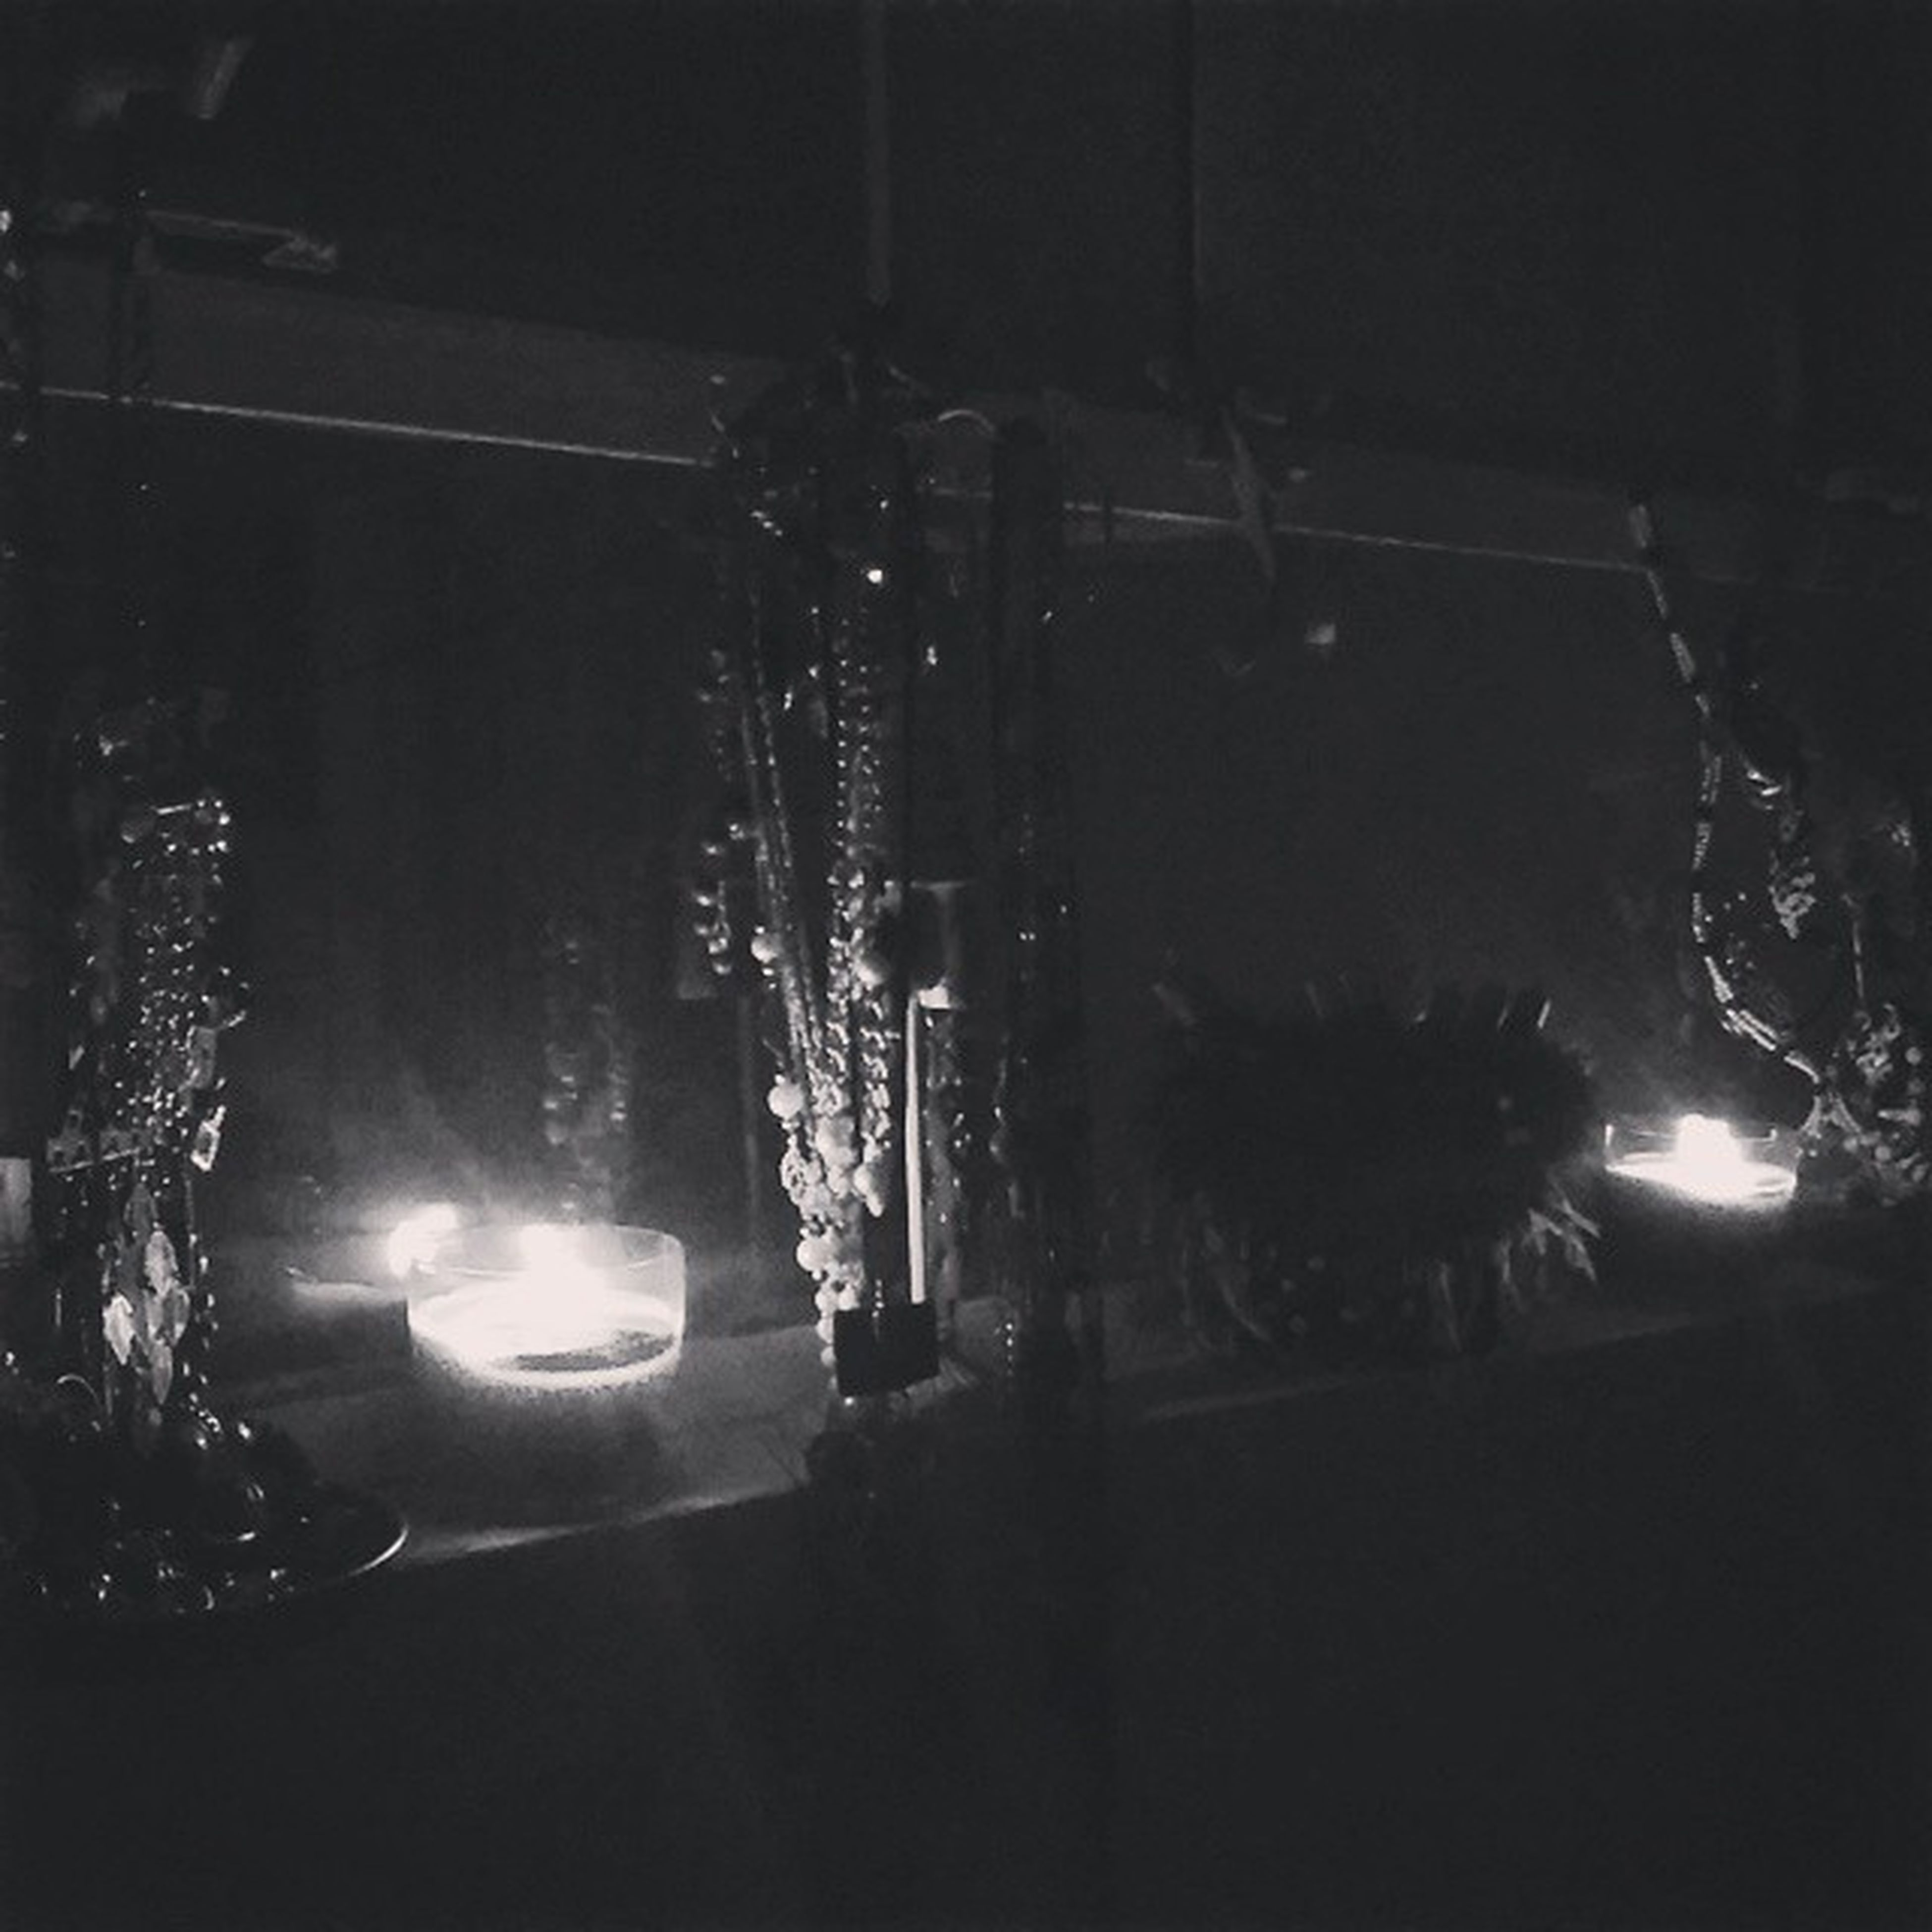 illuminated, night, lighting equipment, building exterior, street light, built structure, architecture, dark, street, light - natural phenomenon, glowing, city, road, outdoors, electricity, light beam, no people, sky, transportation, land vehicle